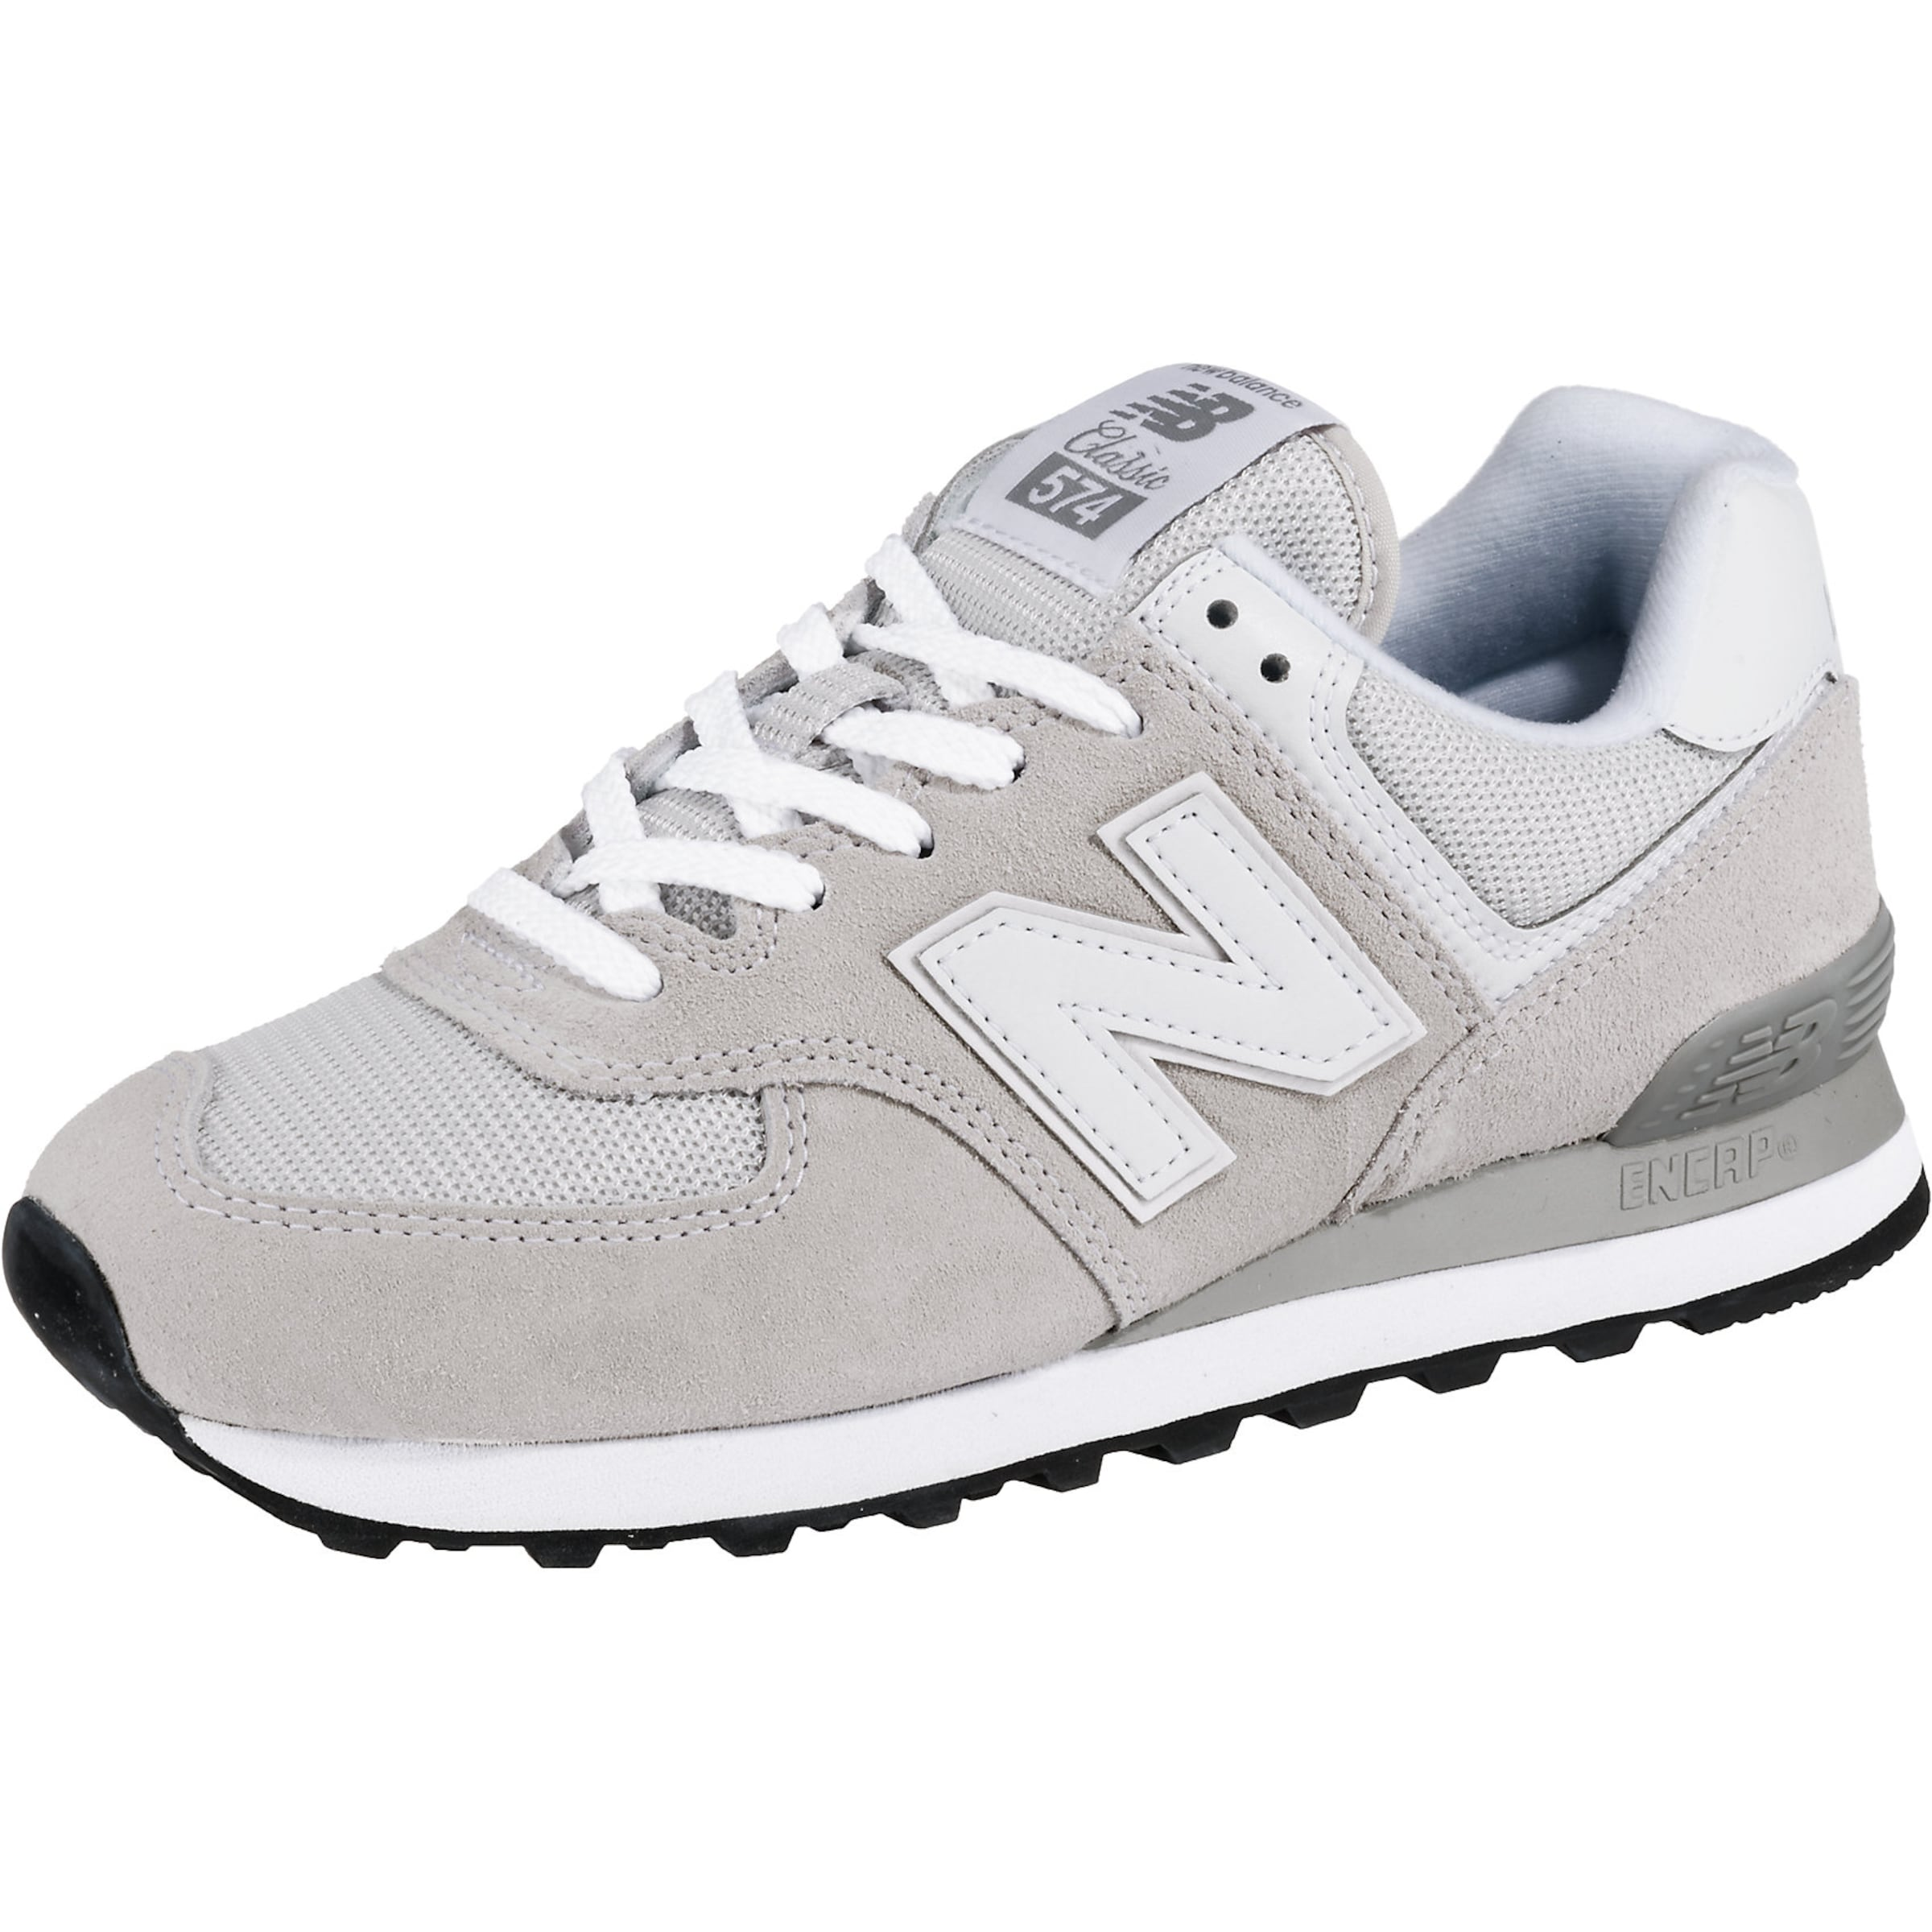 In 'wl574 Silber Sneaker Balance B' New oQxBWErdCe